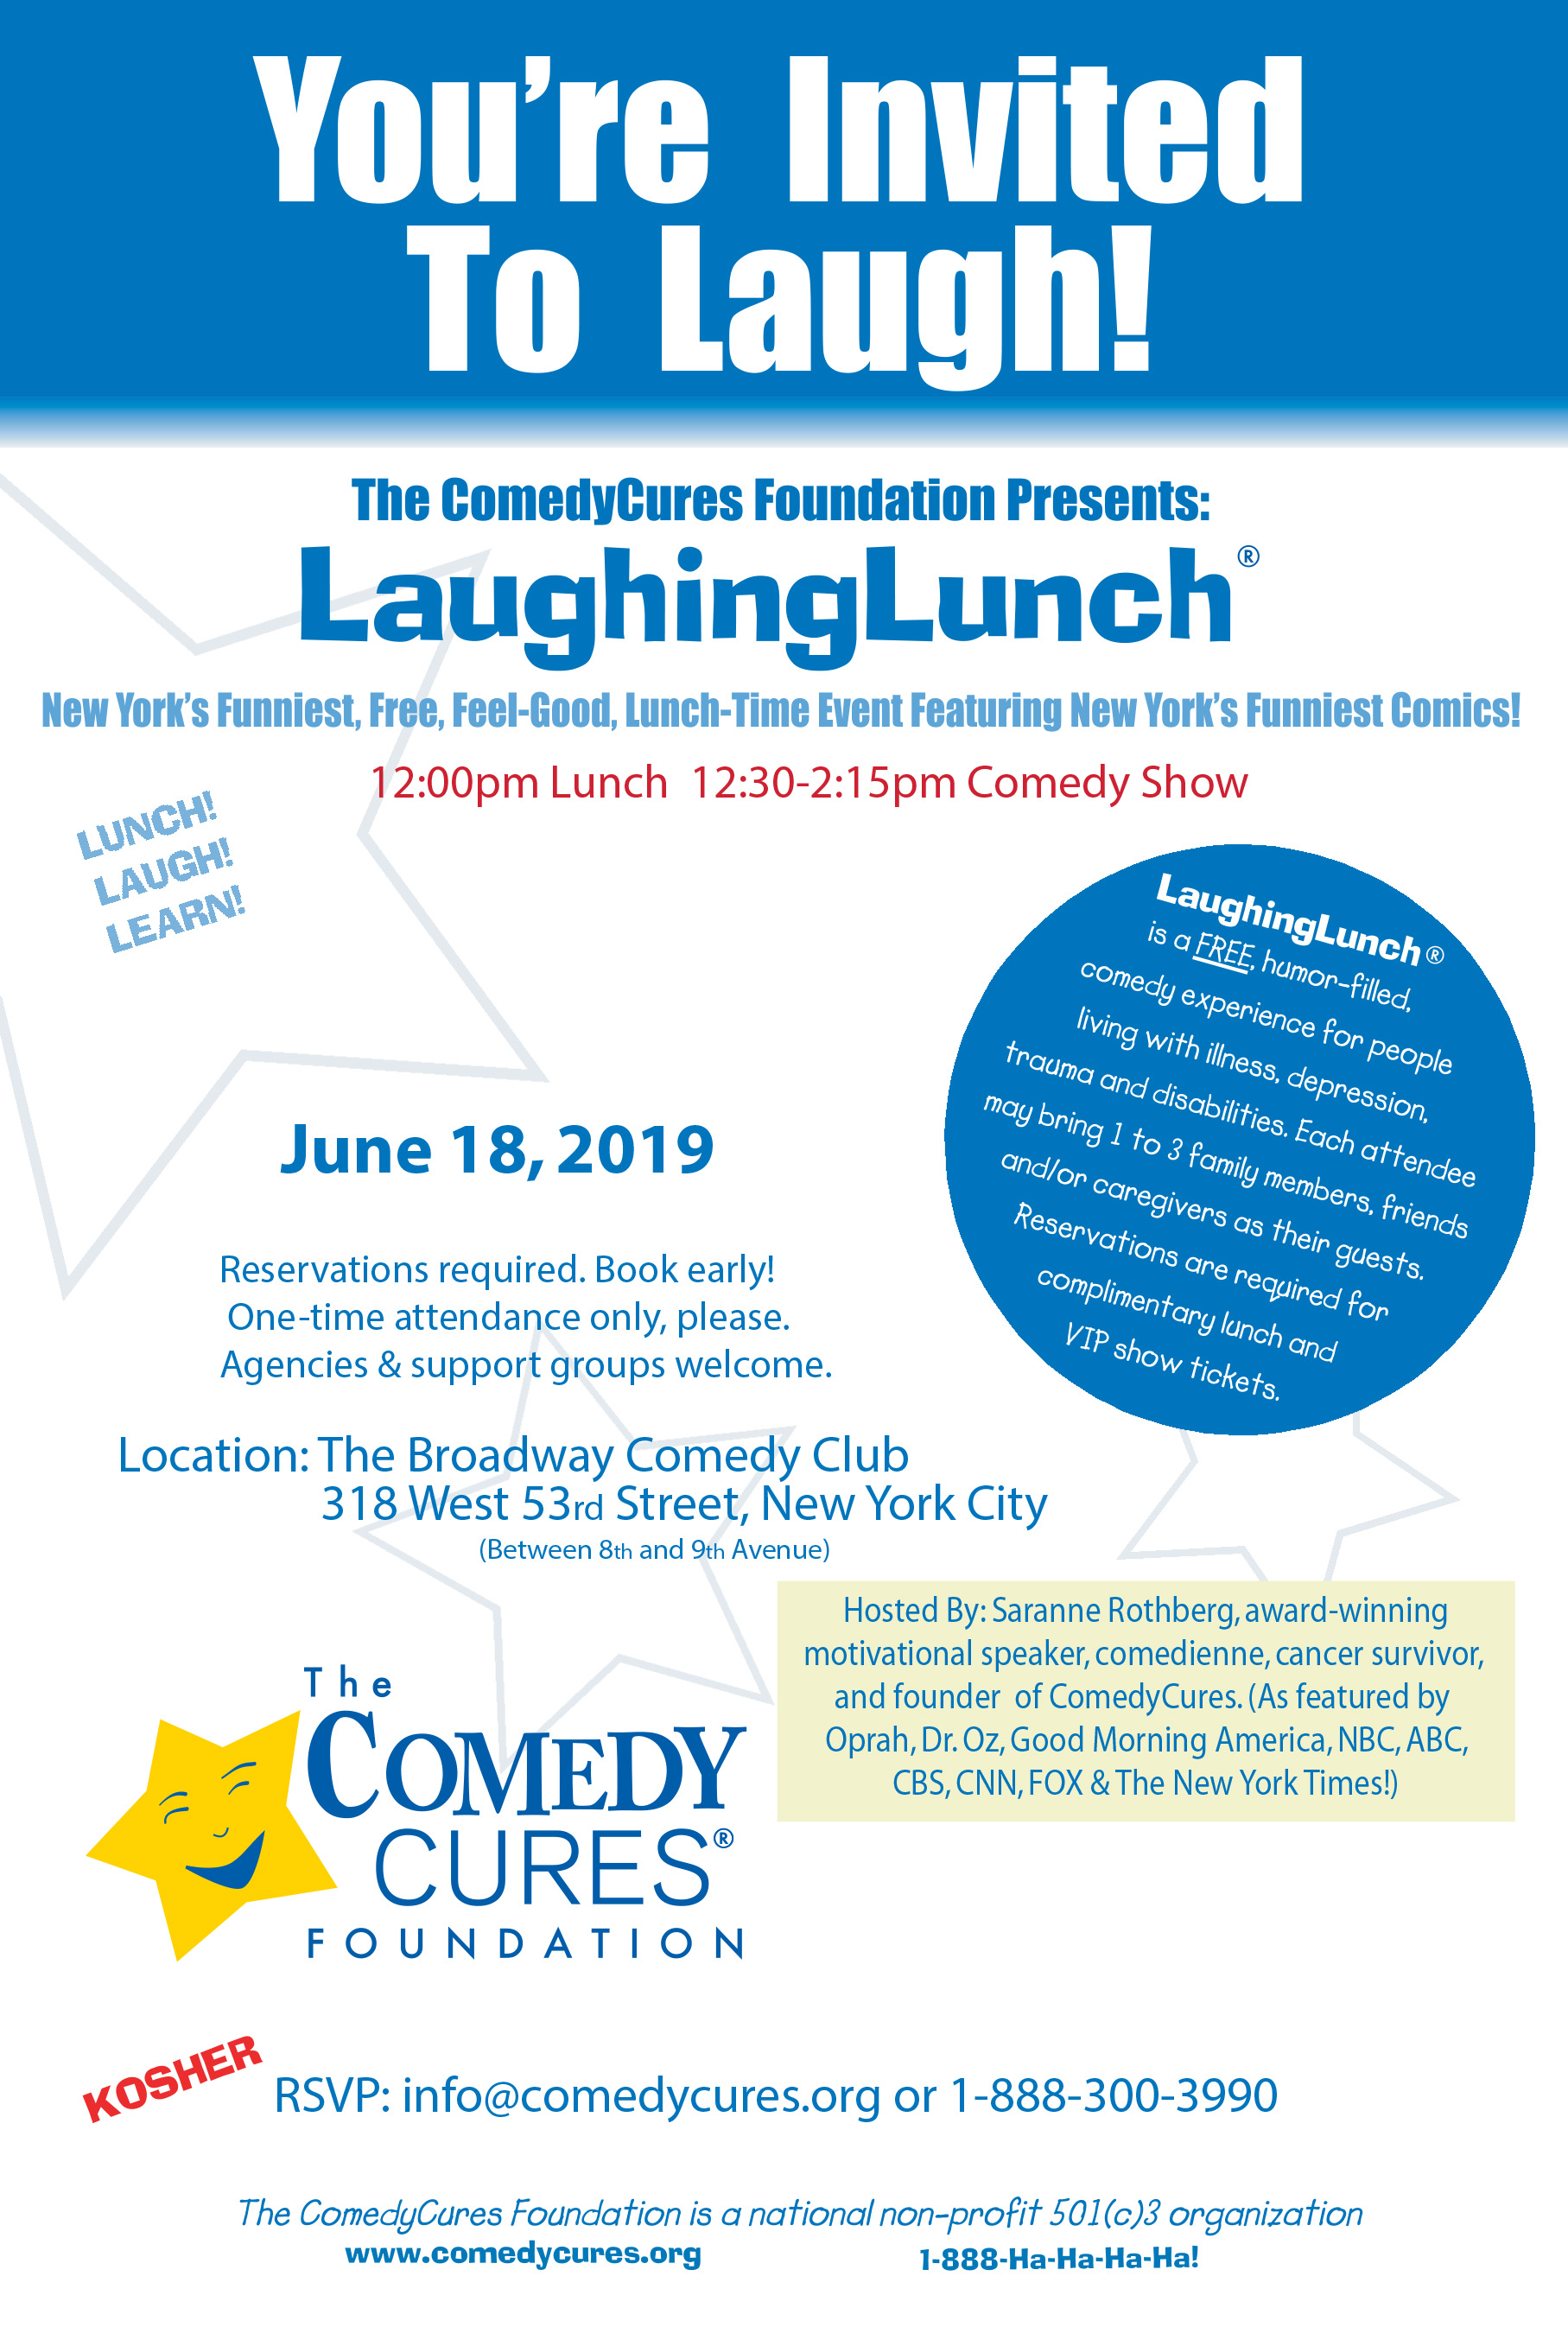 CC LaughingLunch June 18 2019.jpg